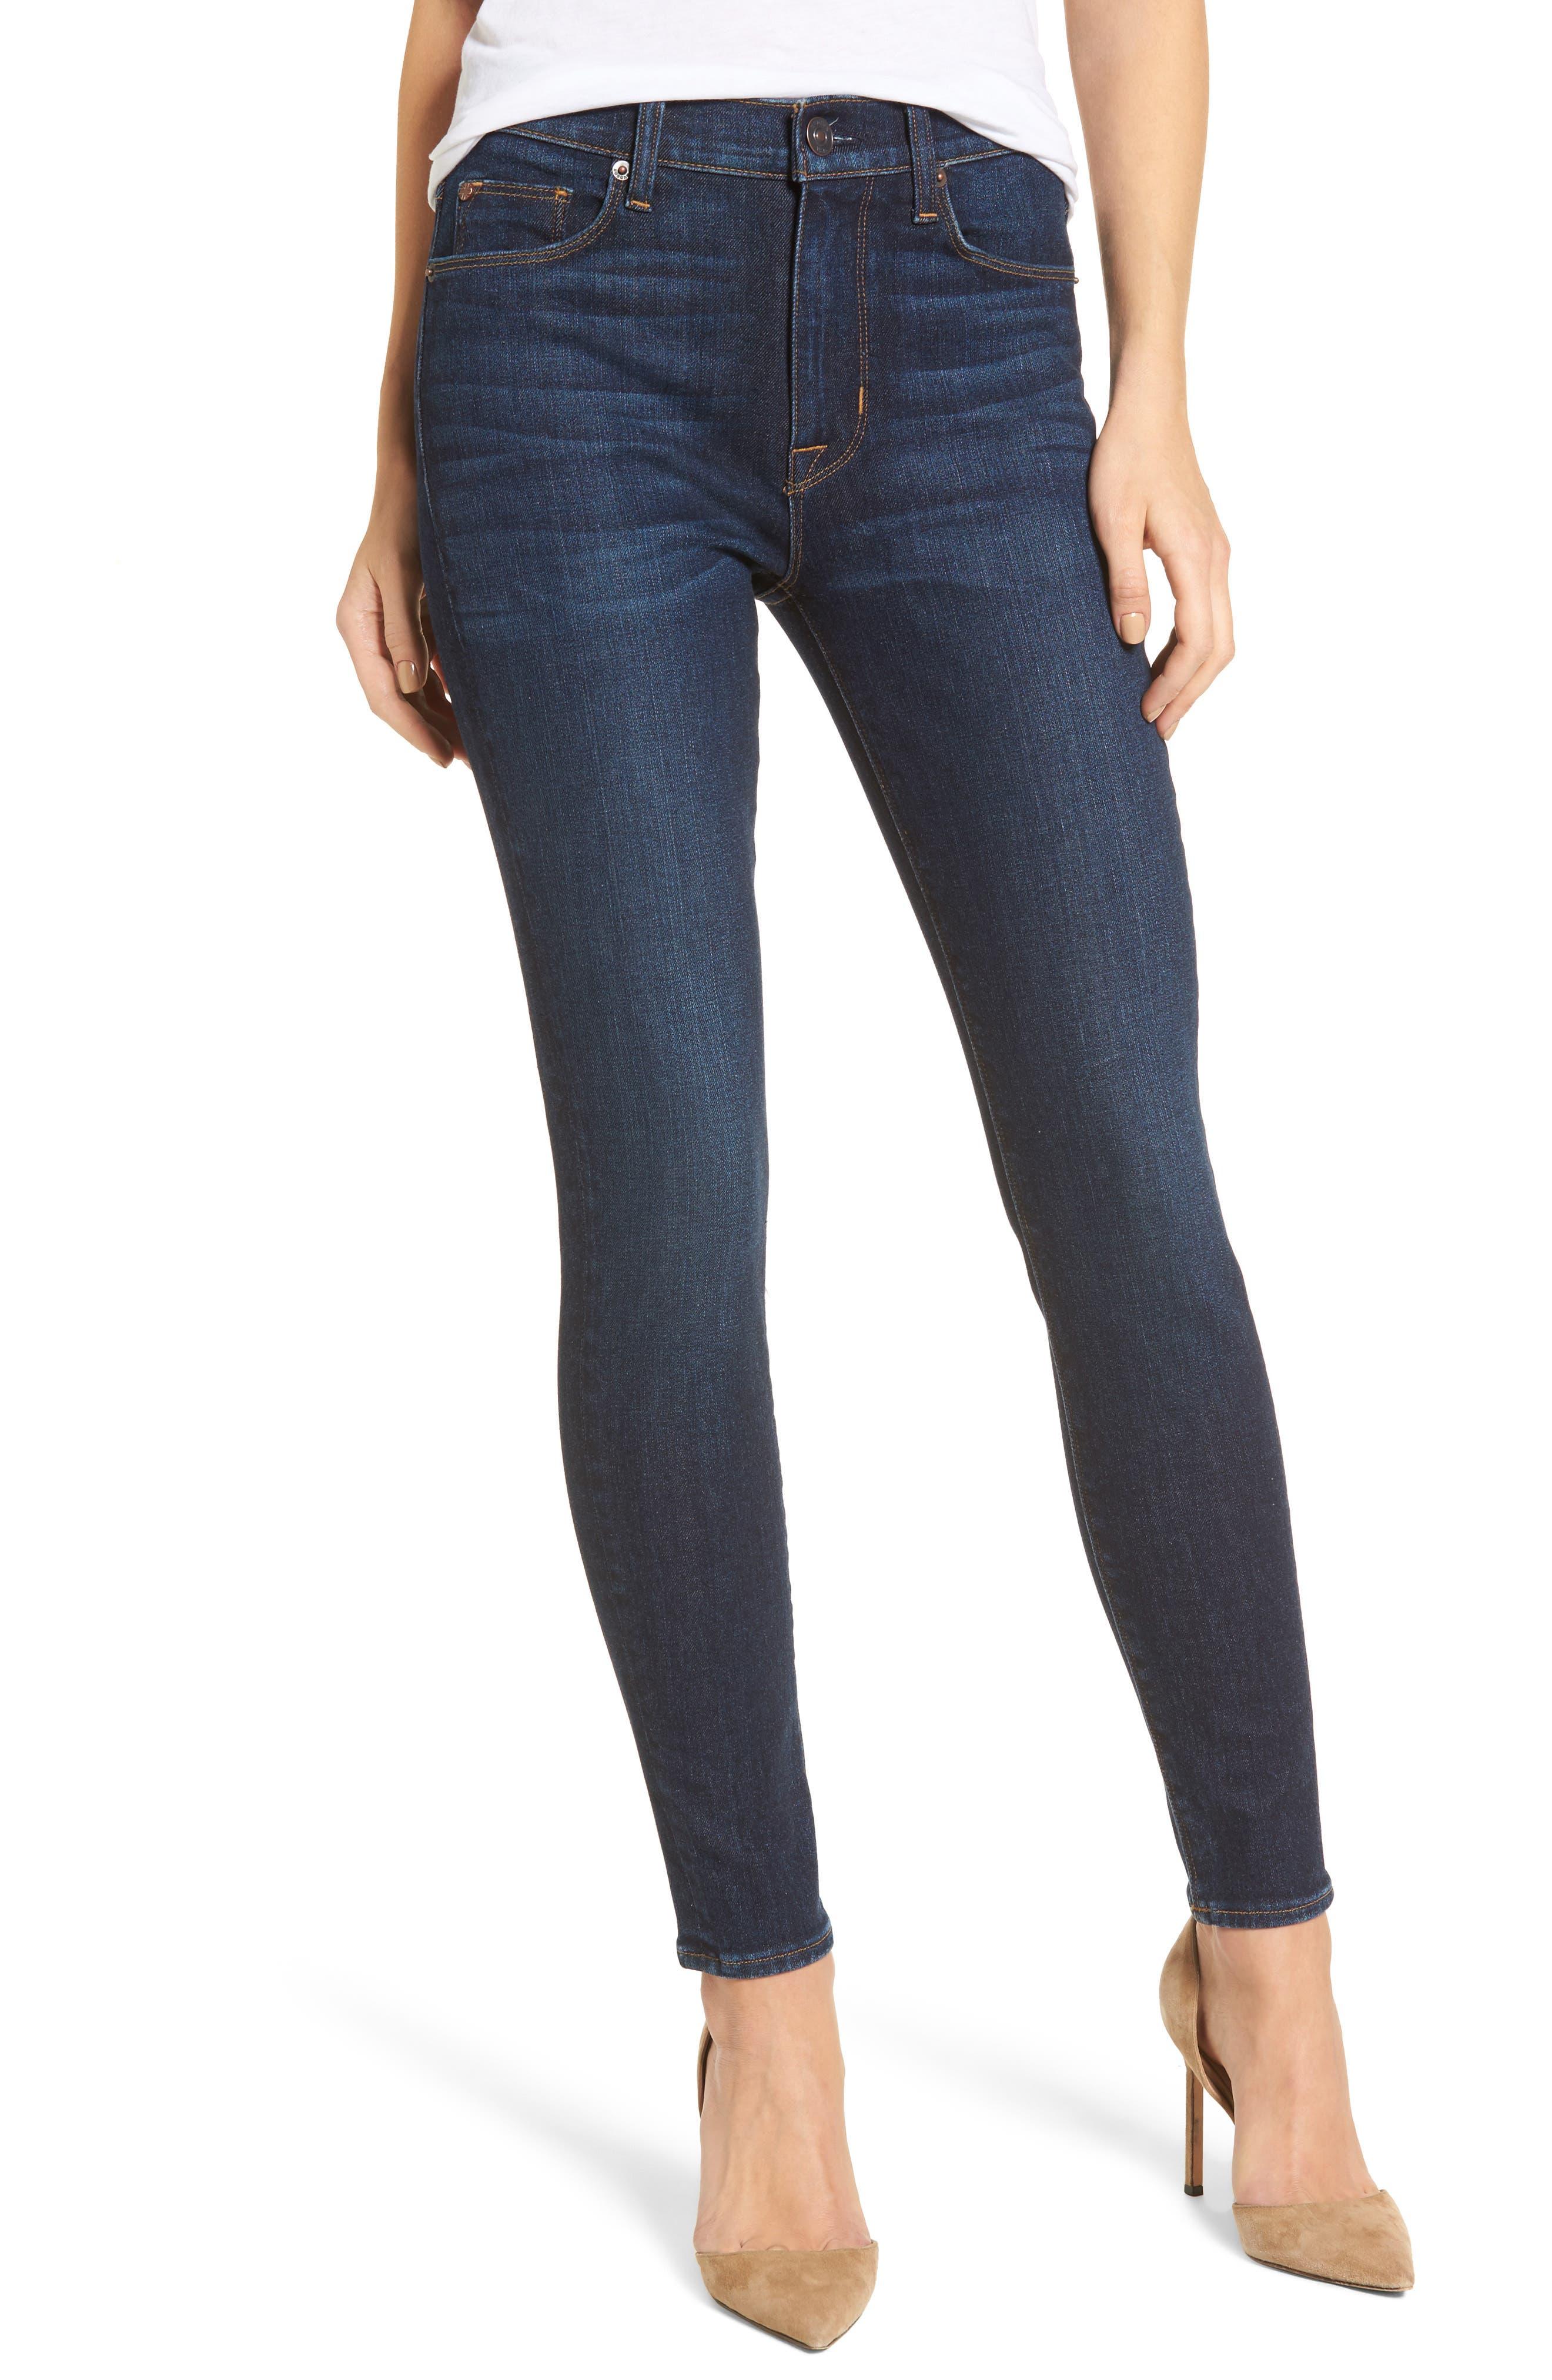 Barbara High Waist Ankle Super Skinny Jeans,                         Main,                         color, Daze